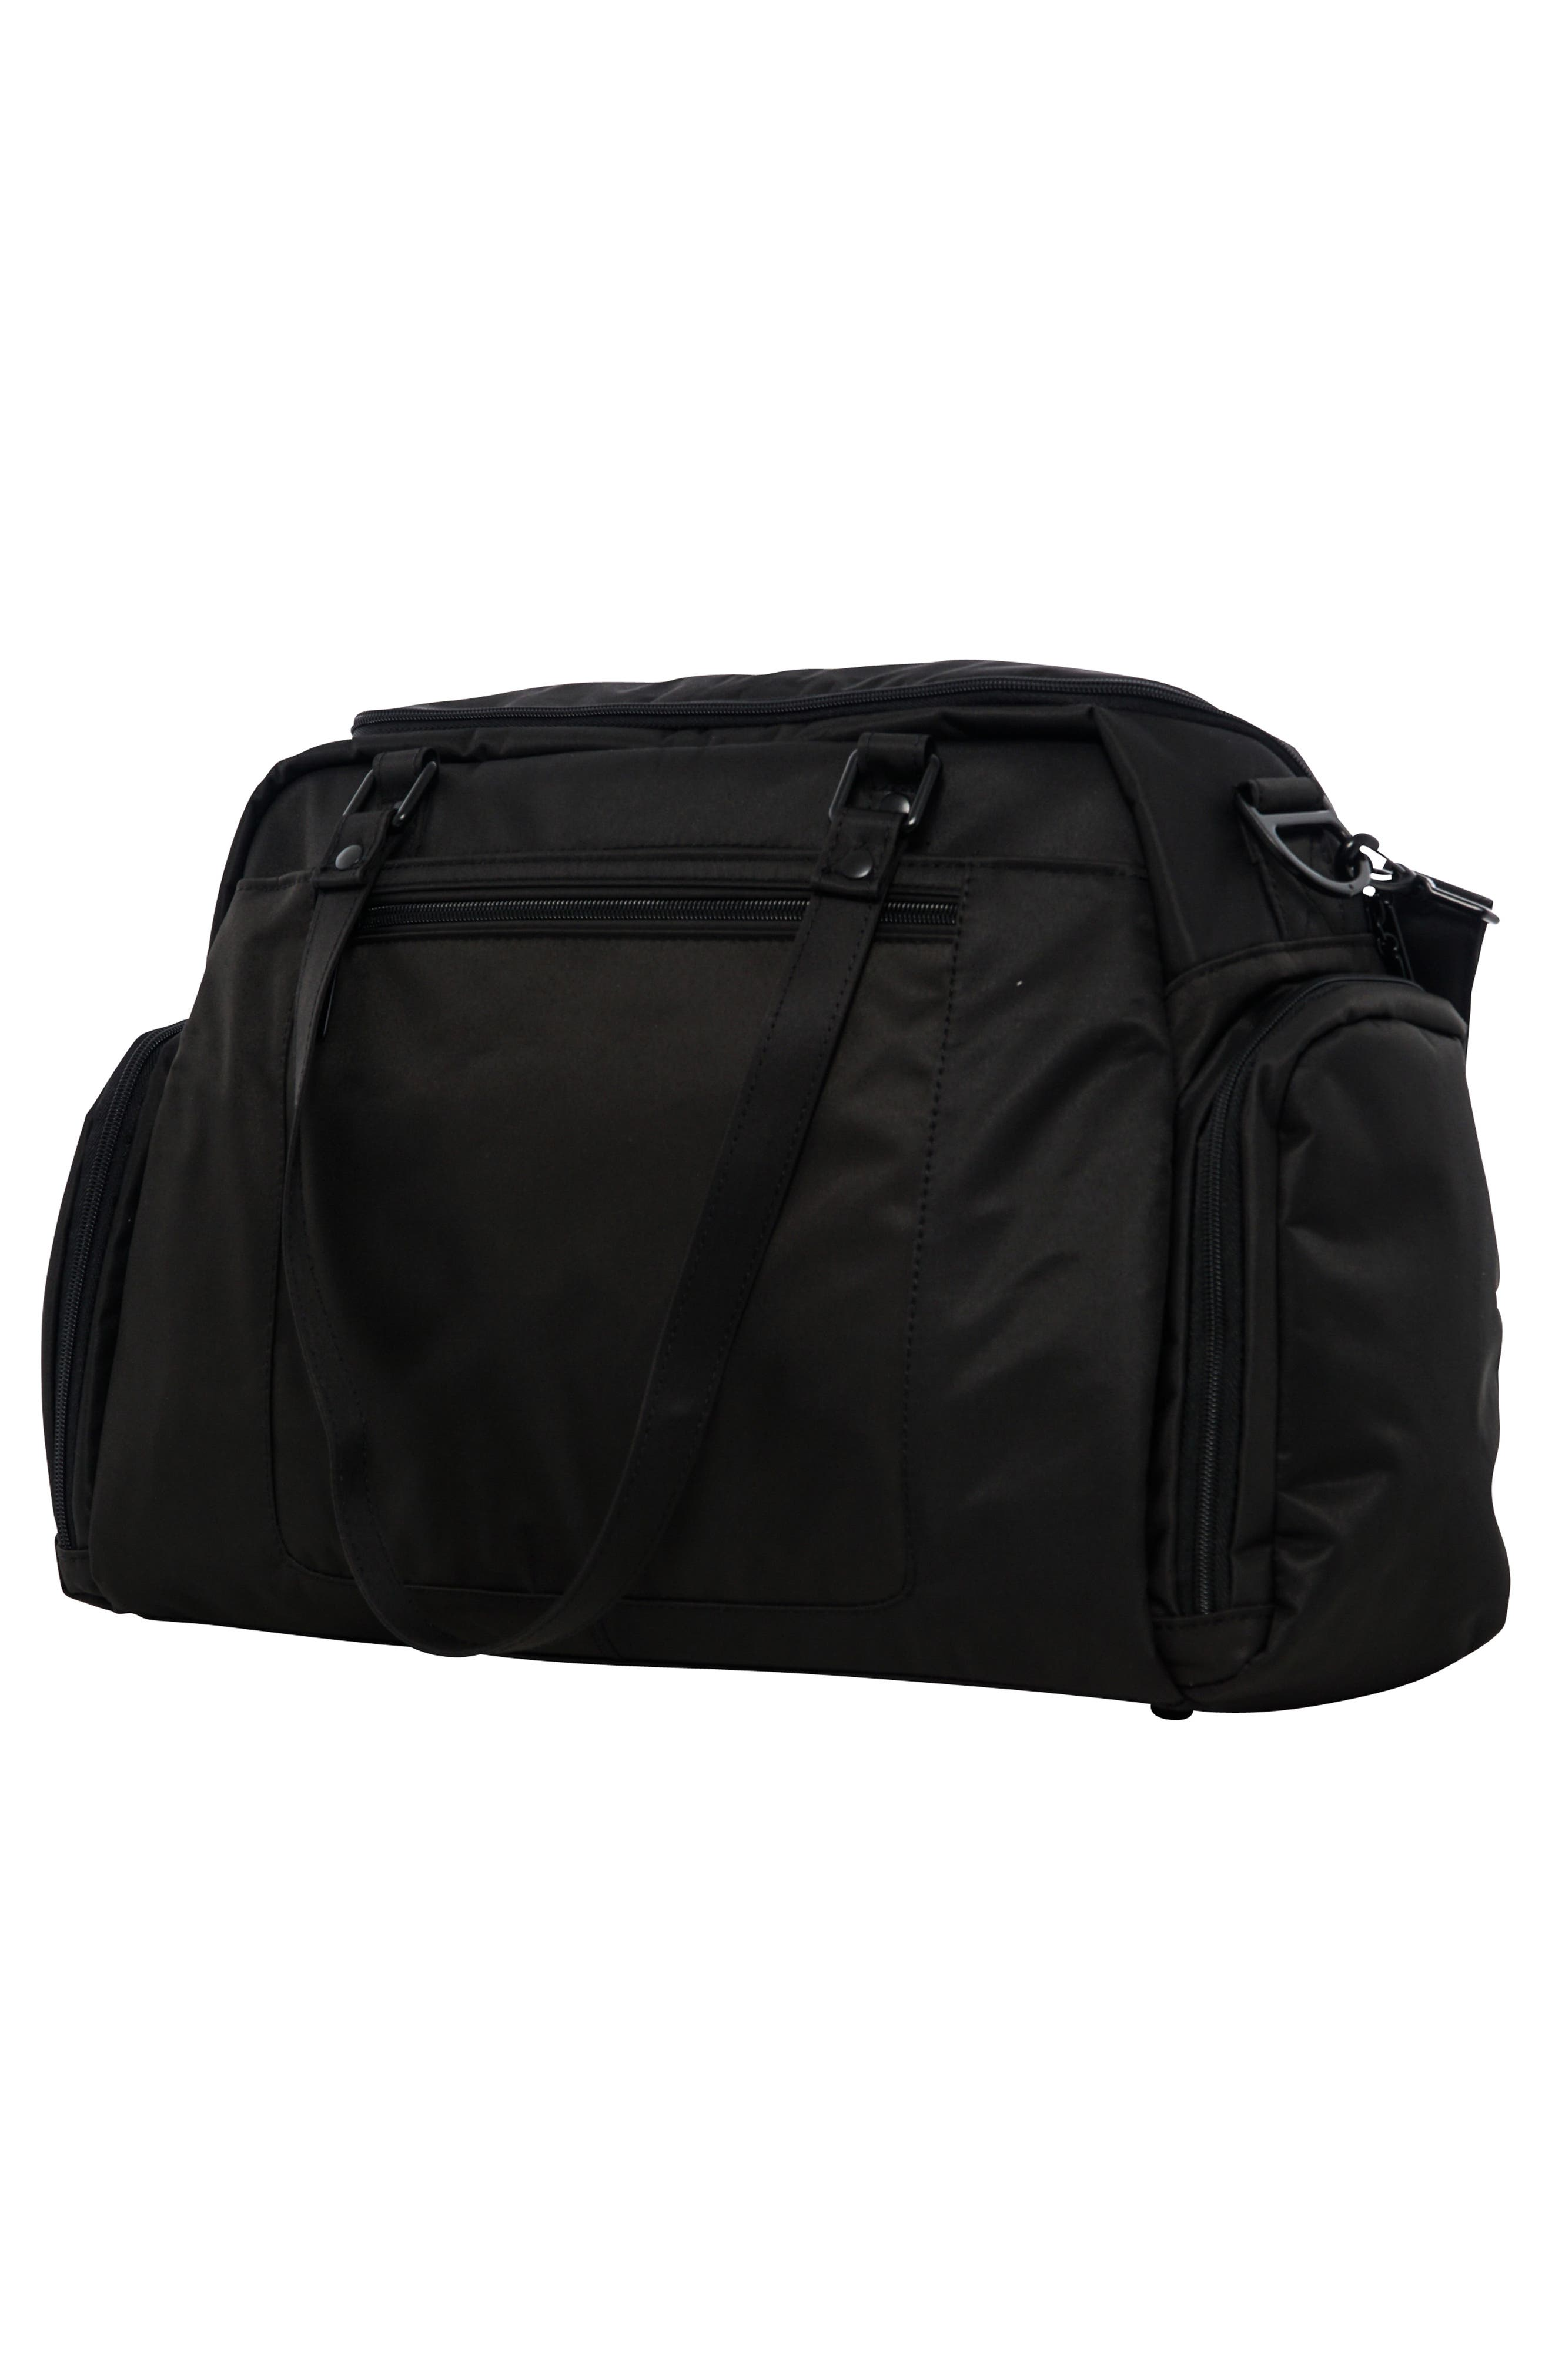 Onyx Be Pumped Bag,                             Alternate thumbnail 3, color,                             001